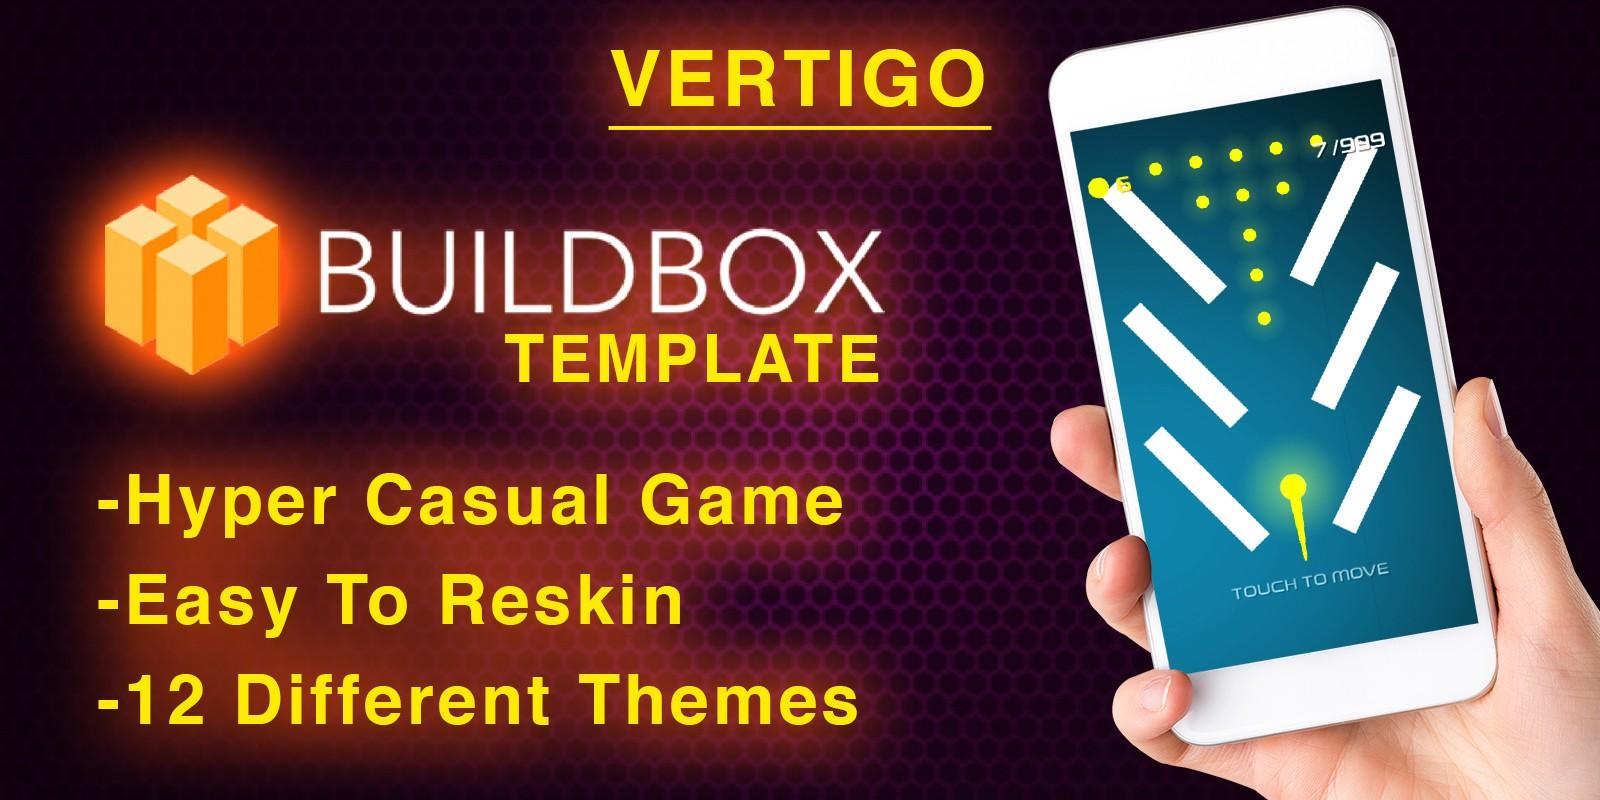 Vertigo - Buildbox Hyper Casual Game Template